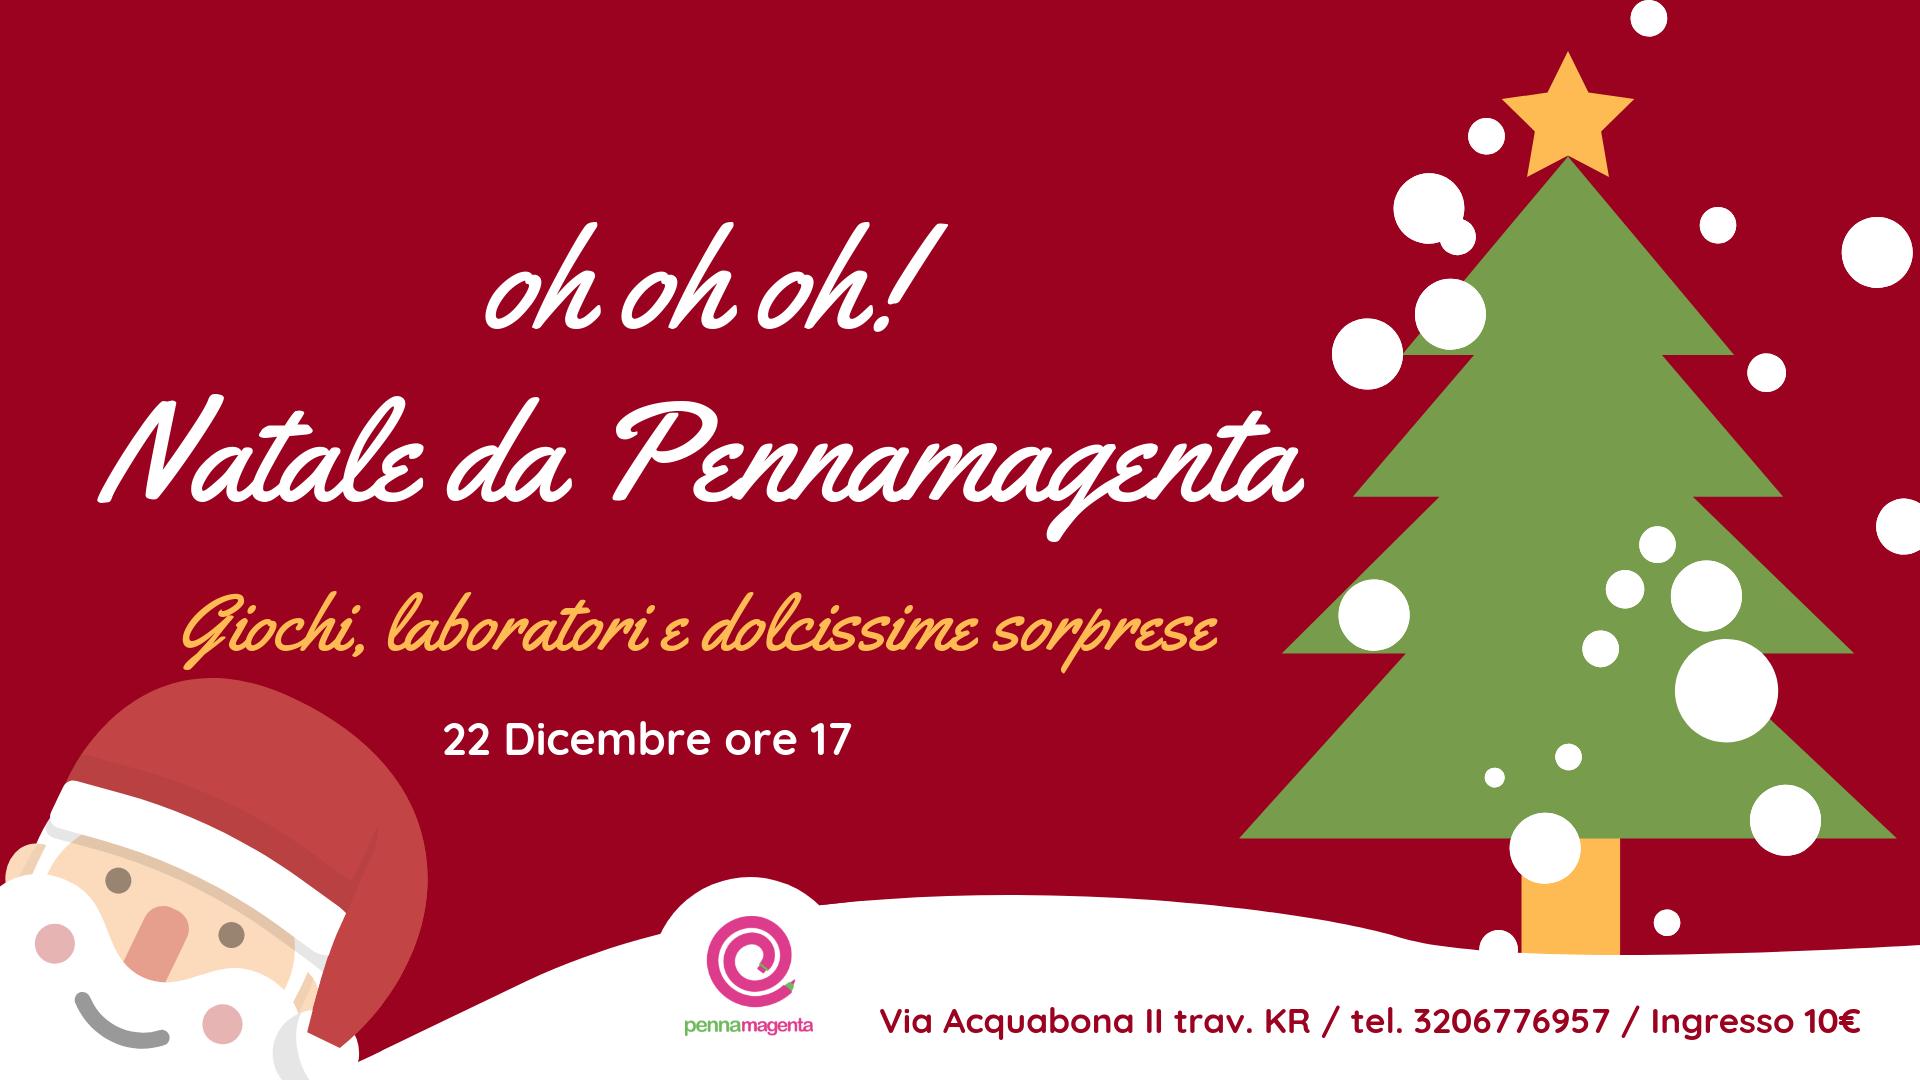 Immagini Copertina Natale.Copertina Festa Di Natale 2018 5 Pennamagenta